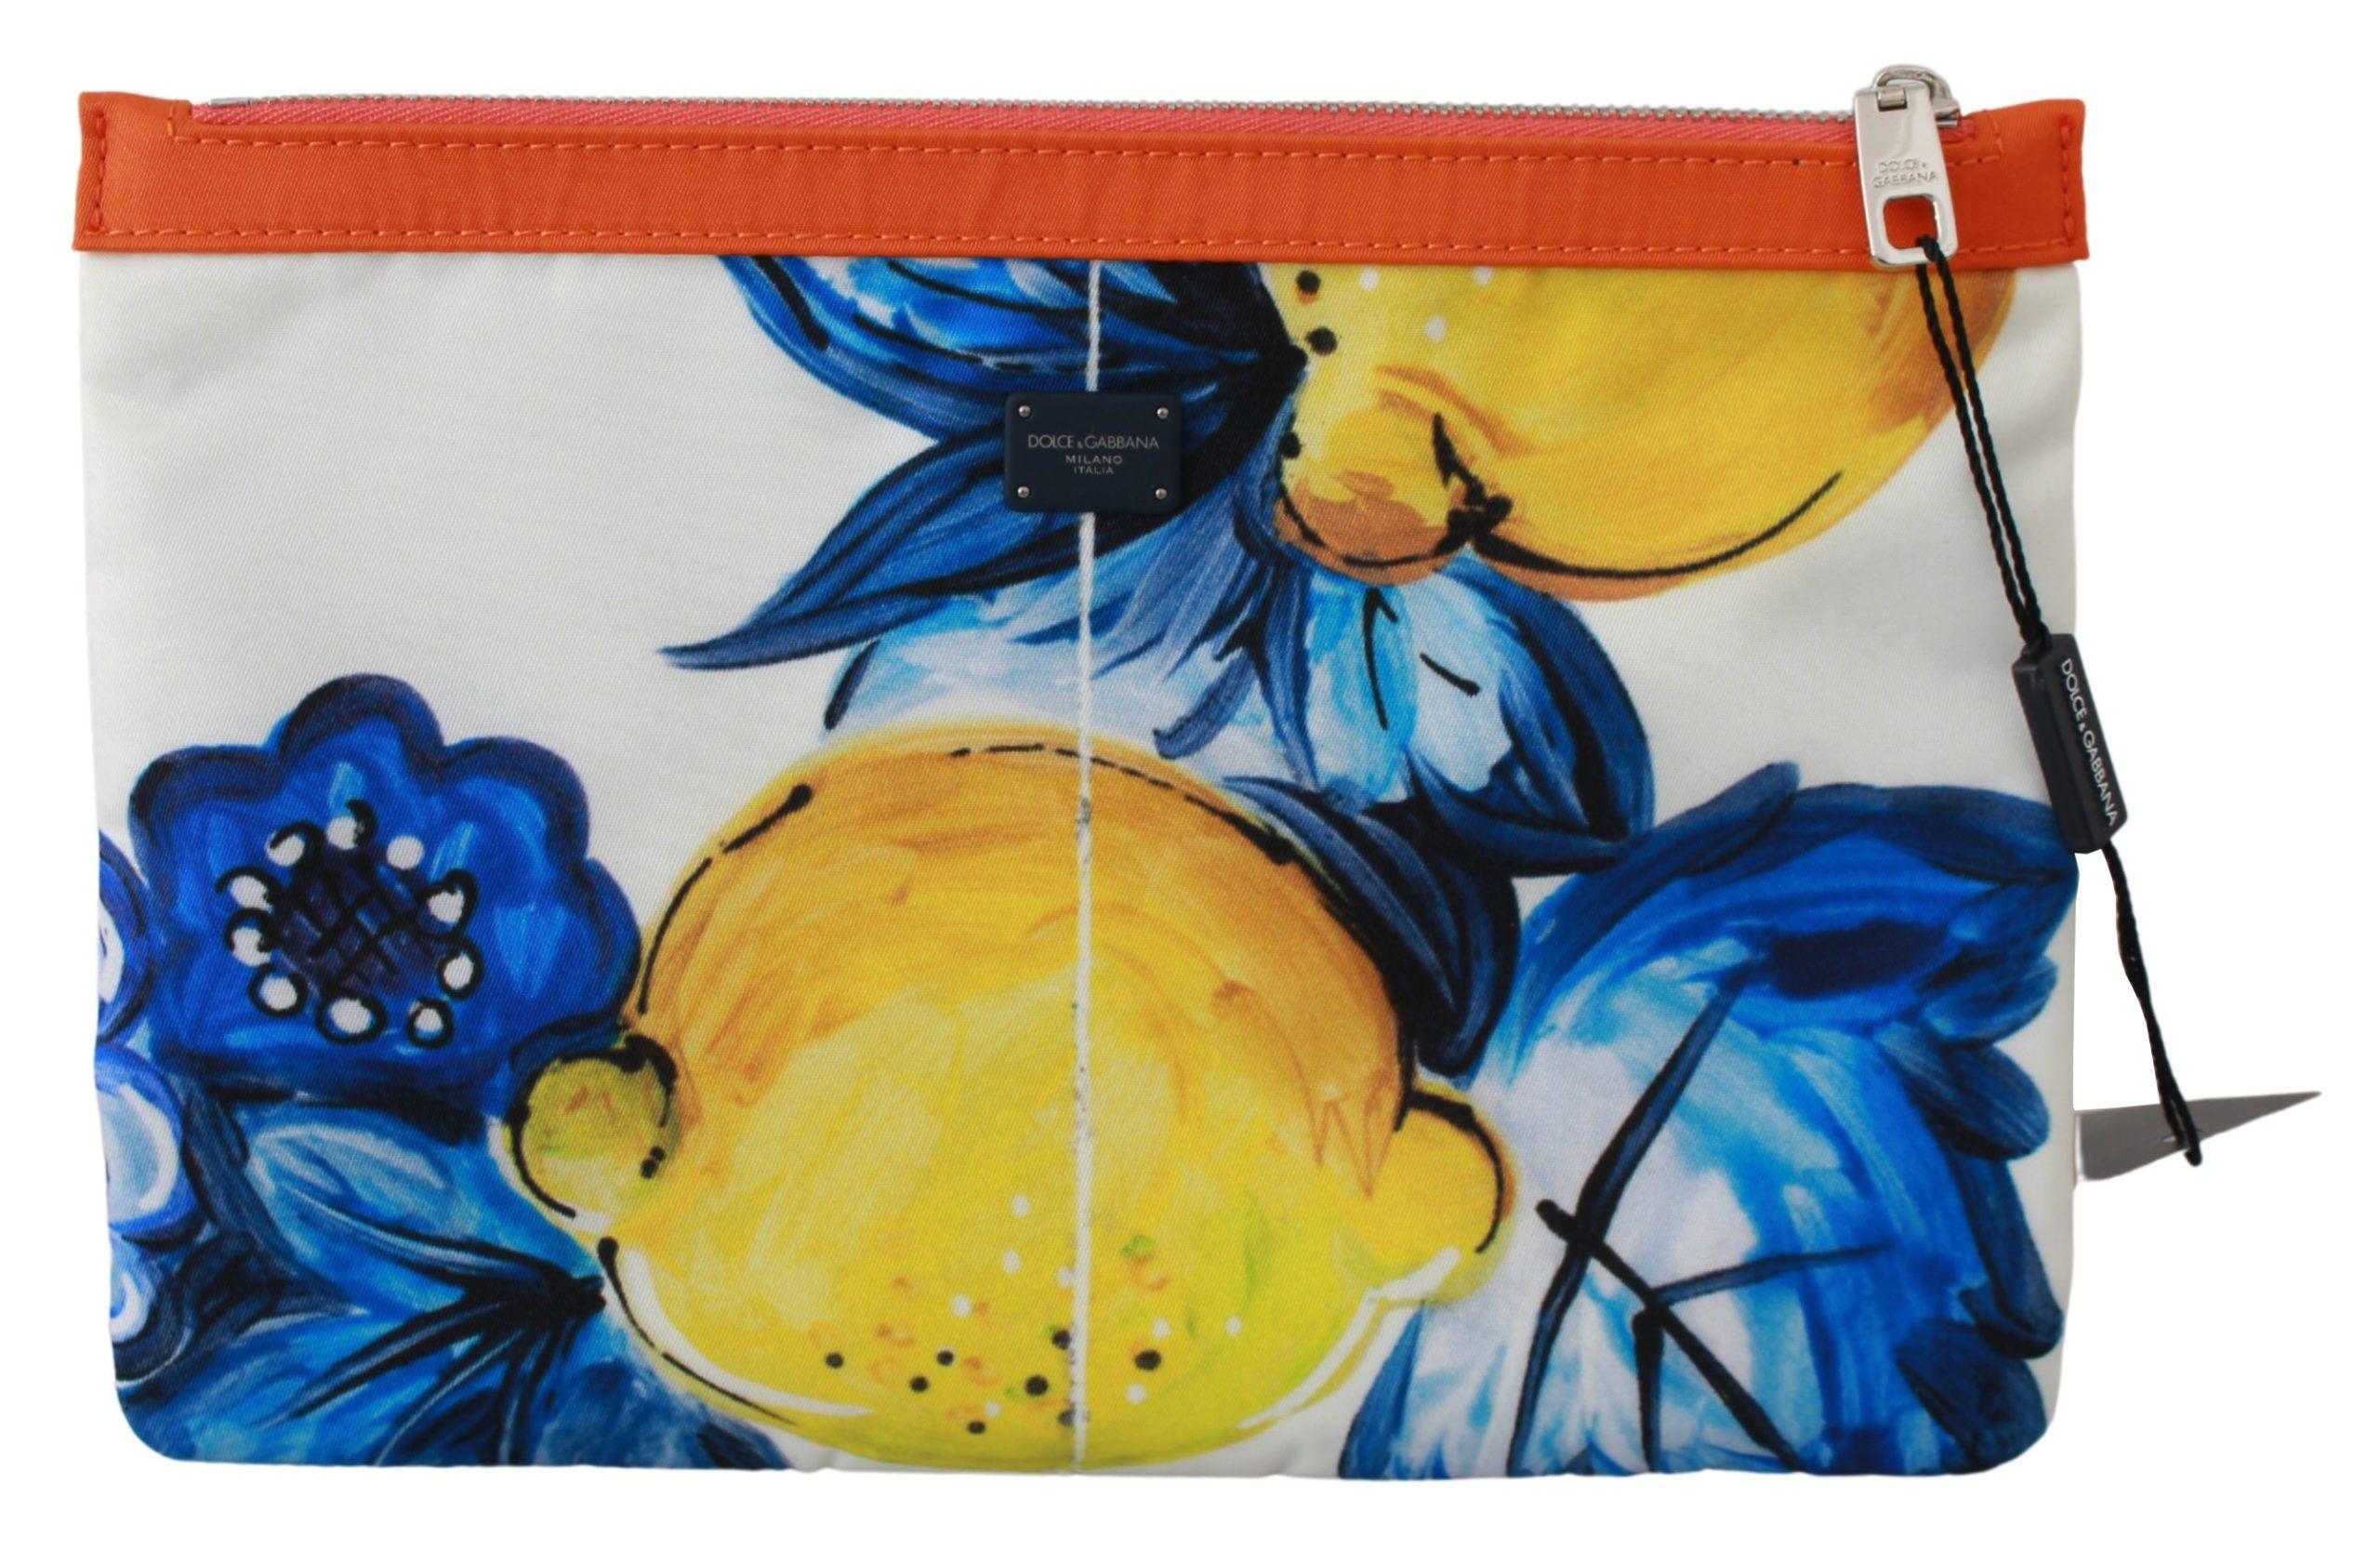 Dolce & Gabbana Men's Lemon Print Hand Pouch Messenger Bag Multicolor VAS9497